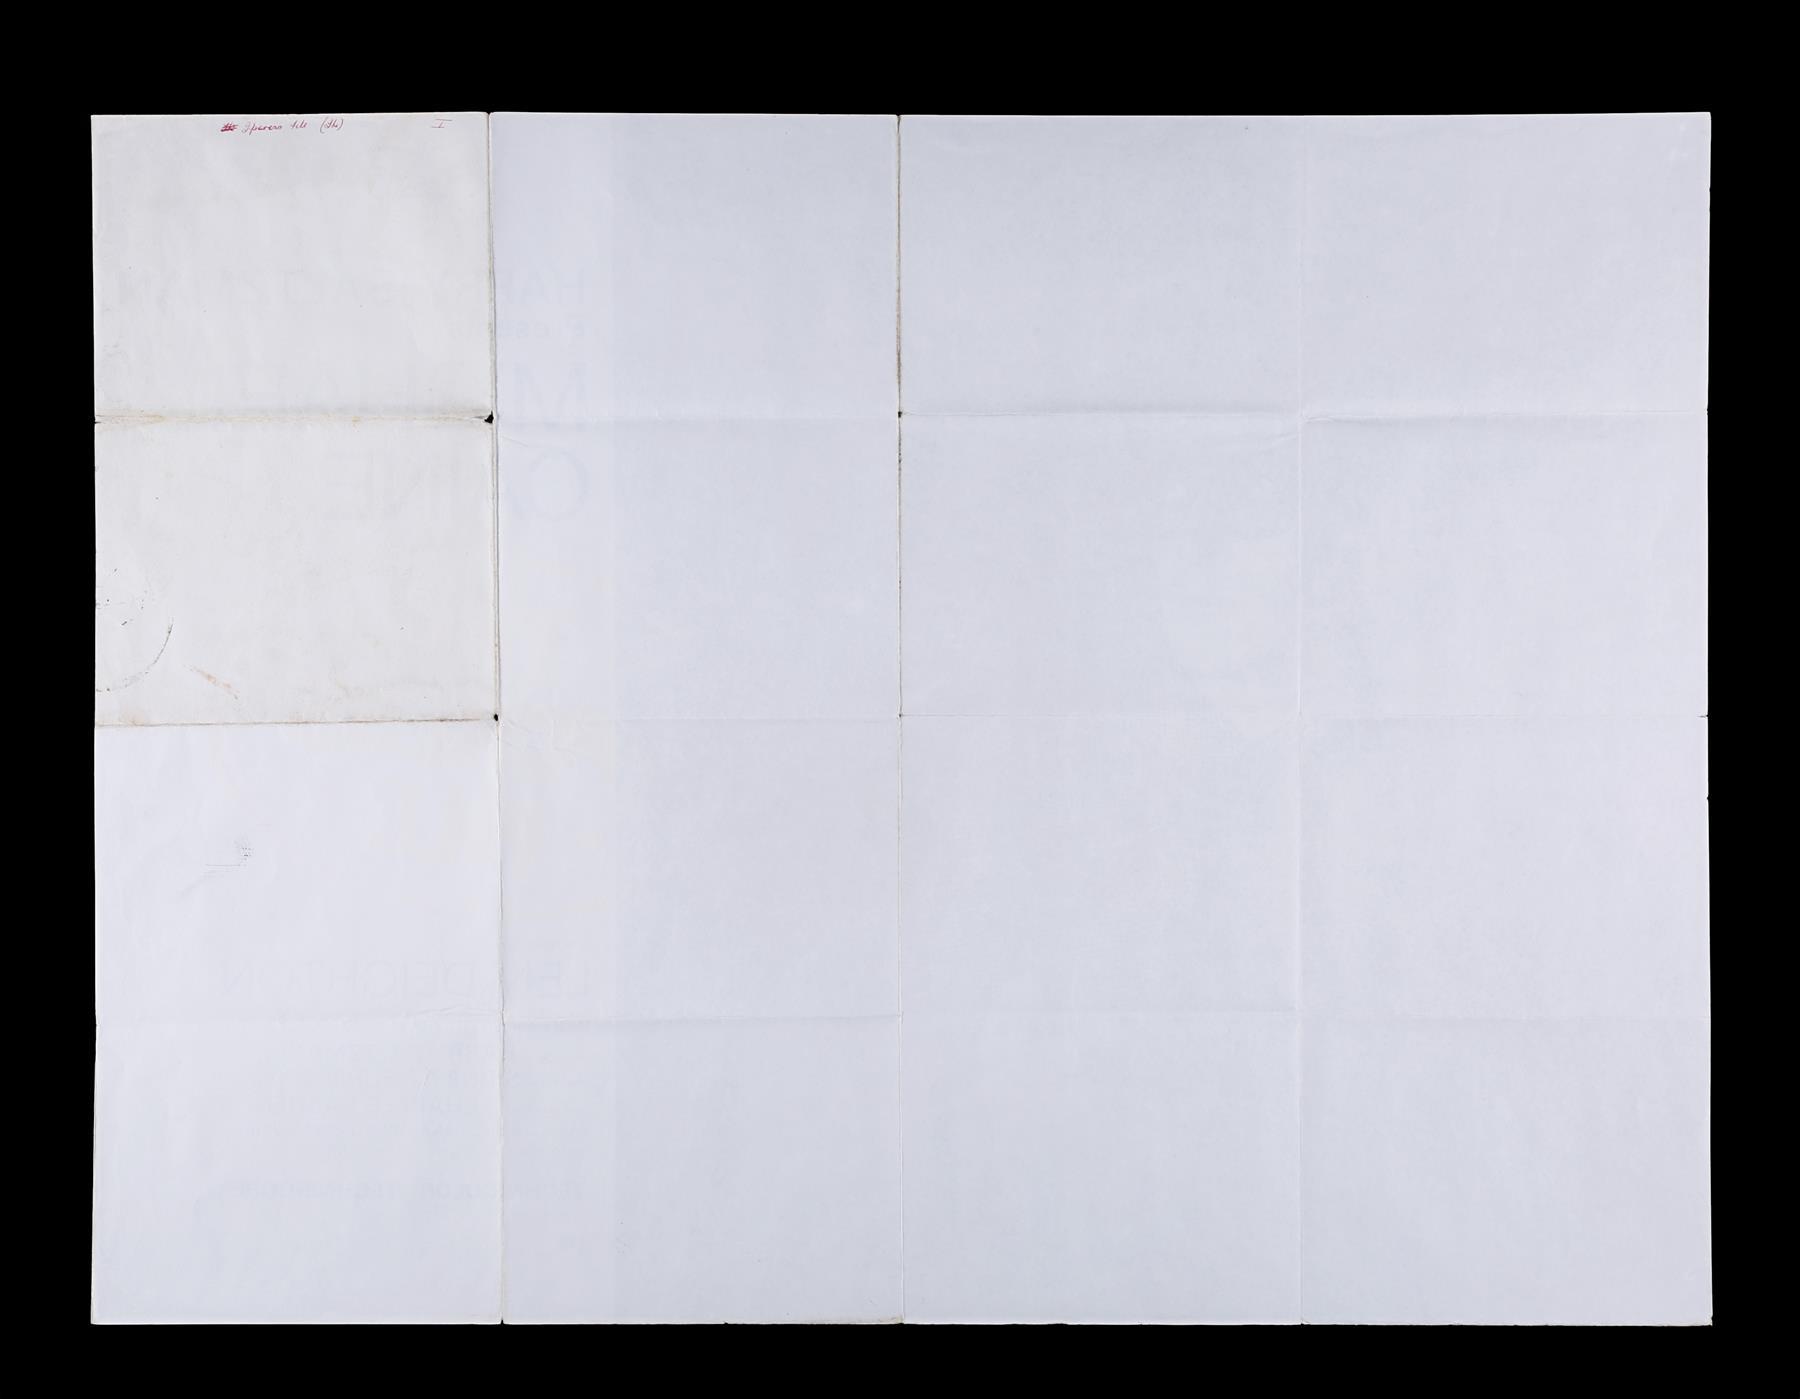 IPCRESS FILE (1965) - UK Quad, 1965 - Image 6 of 6